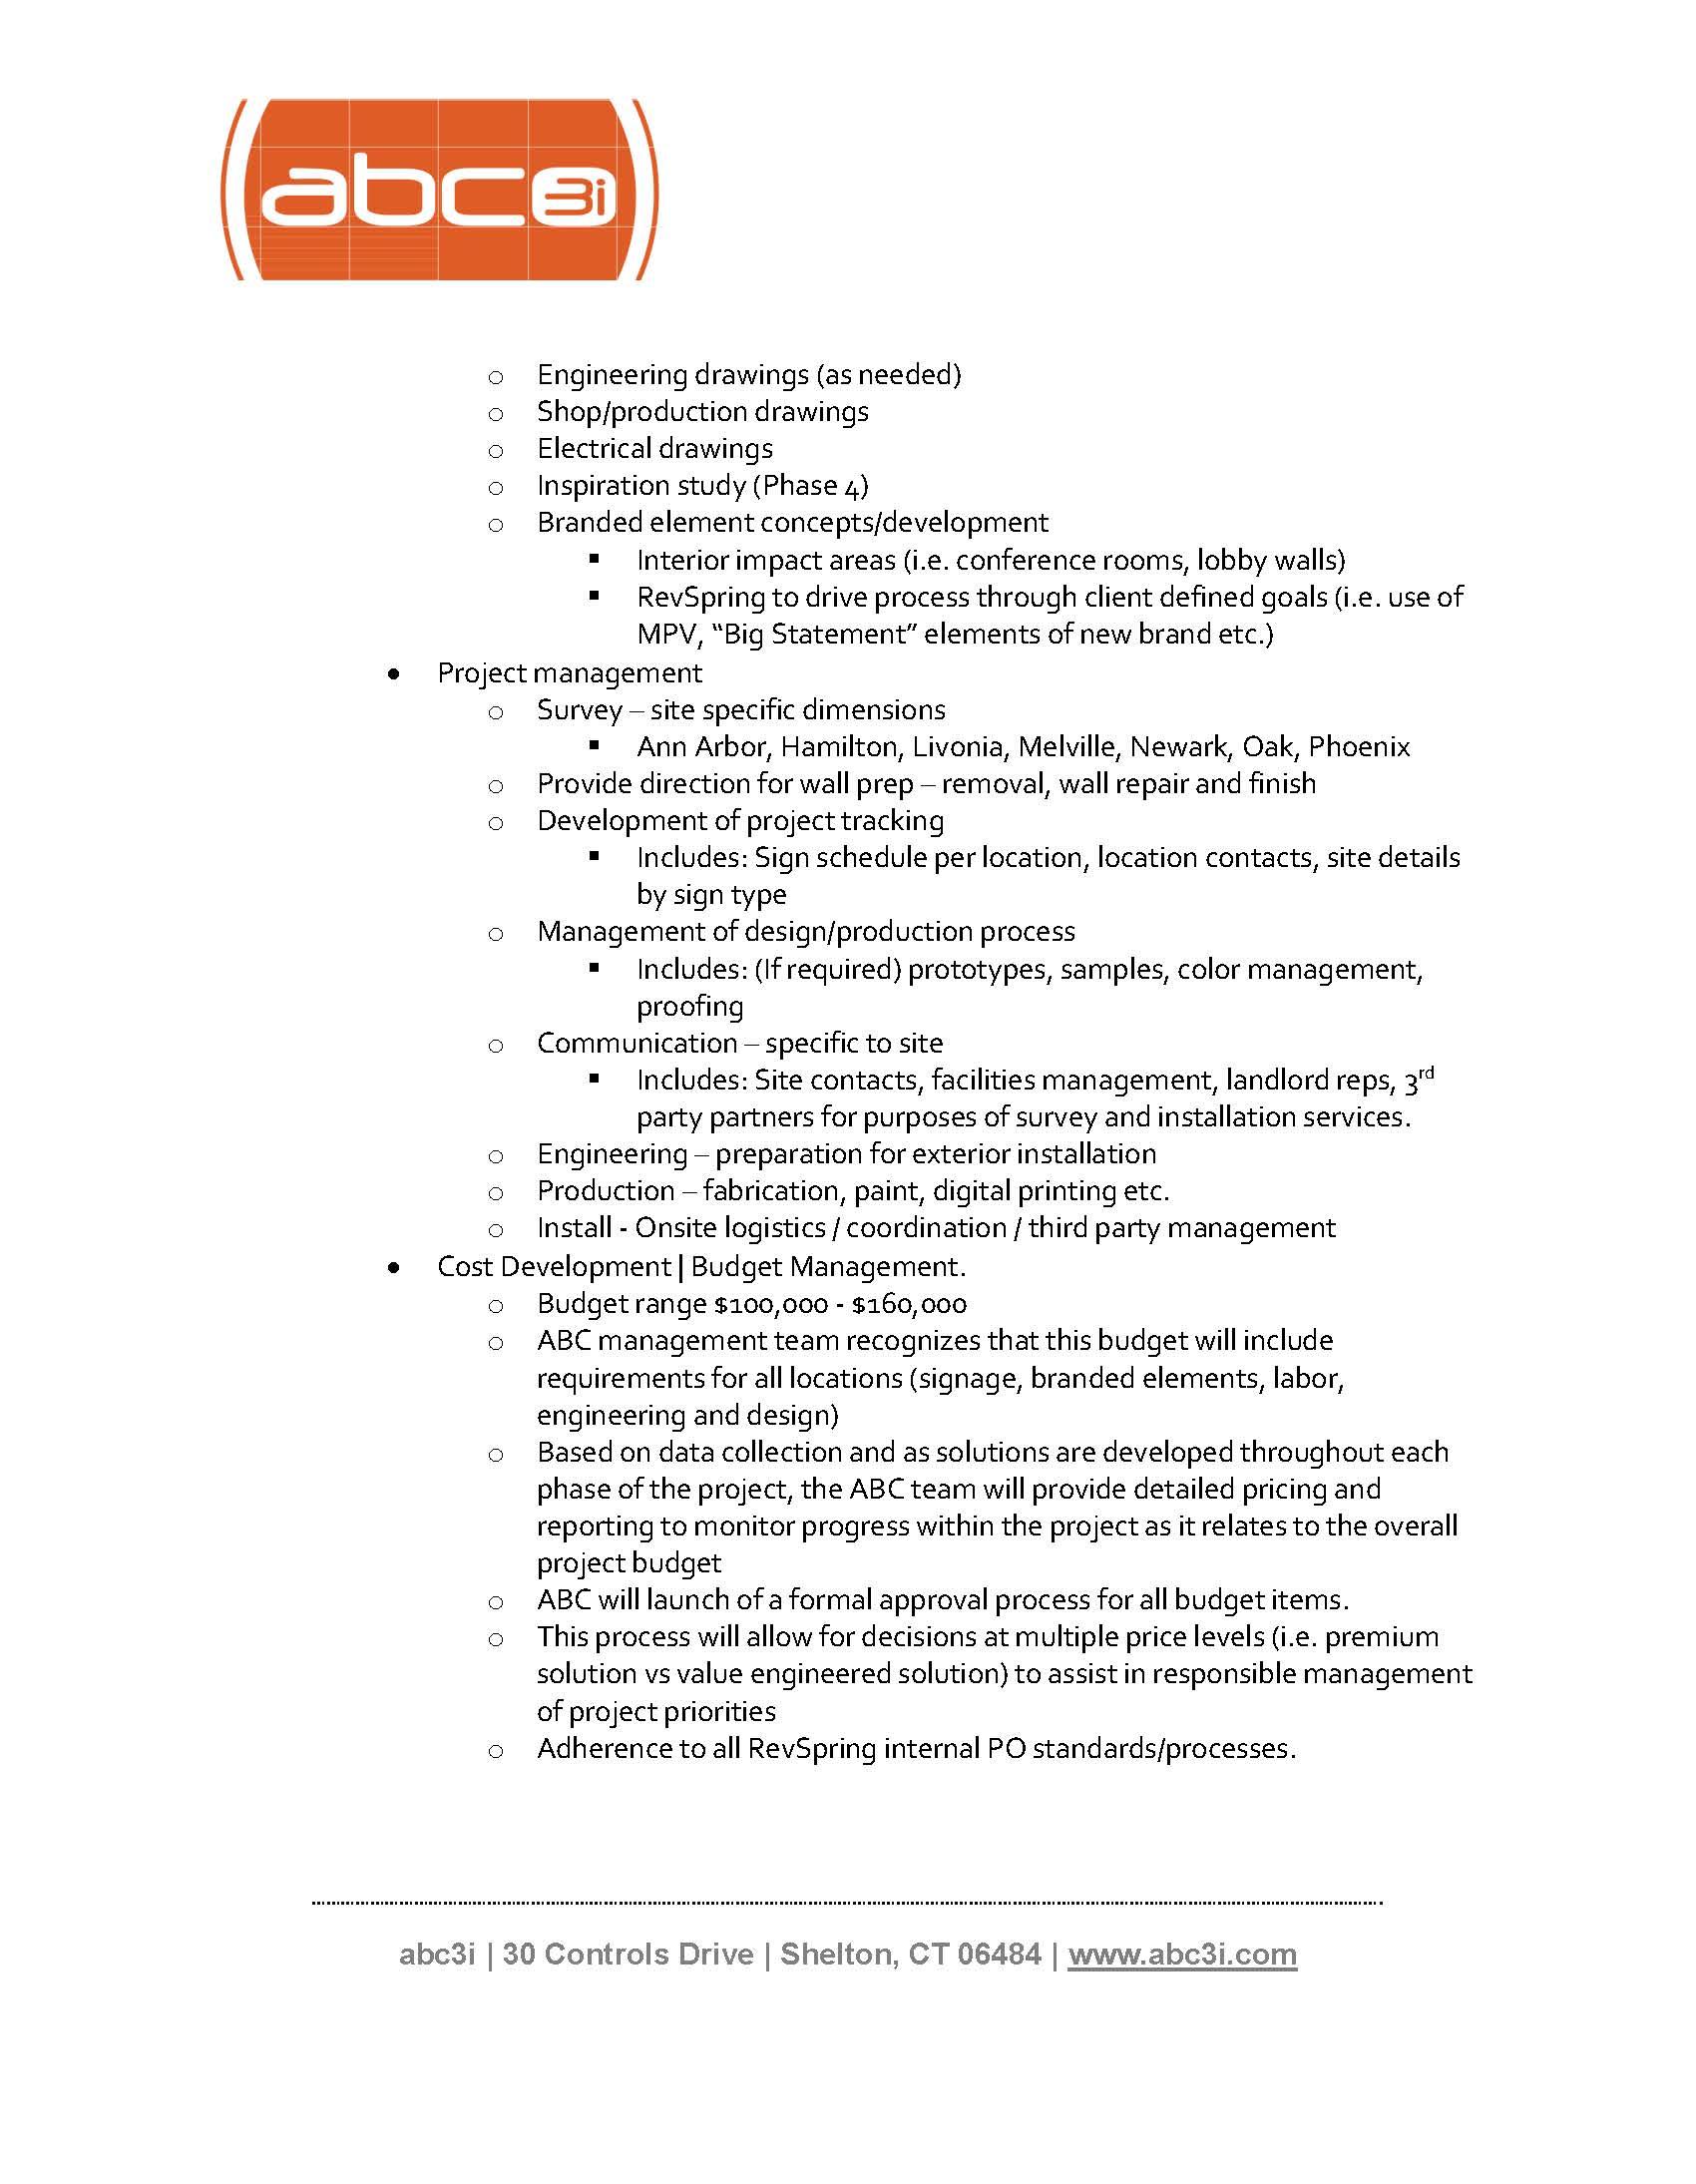 ABC3i_Rev Spring LOI (Draft) 3.30.18_Page_2.jpg